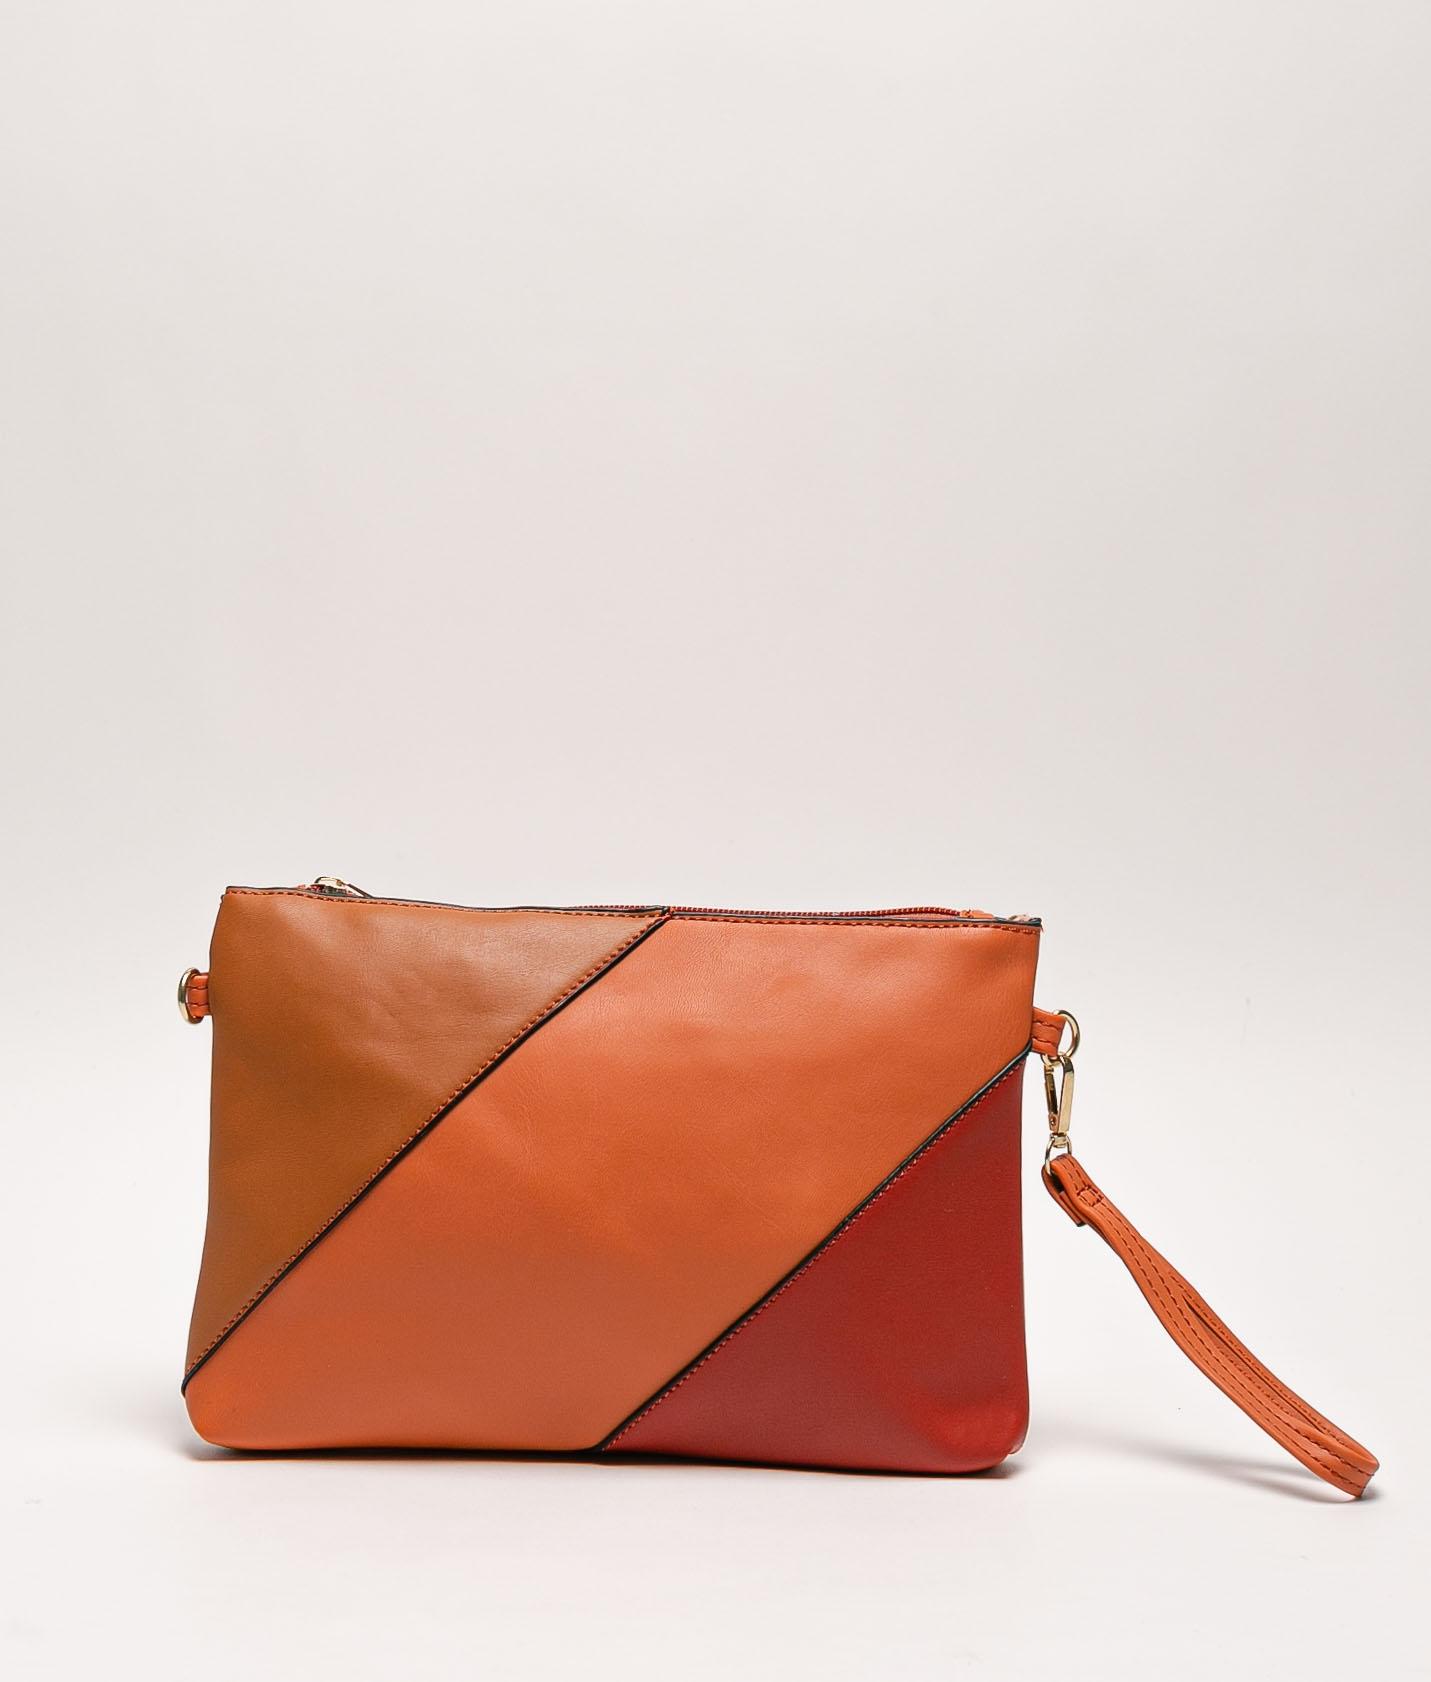 Antares Wallet - Brown